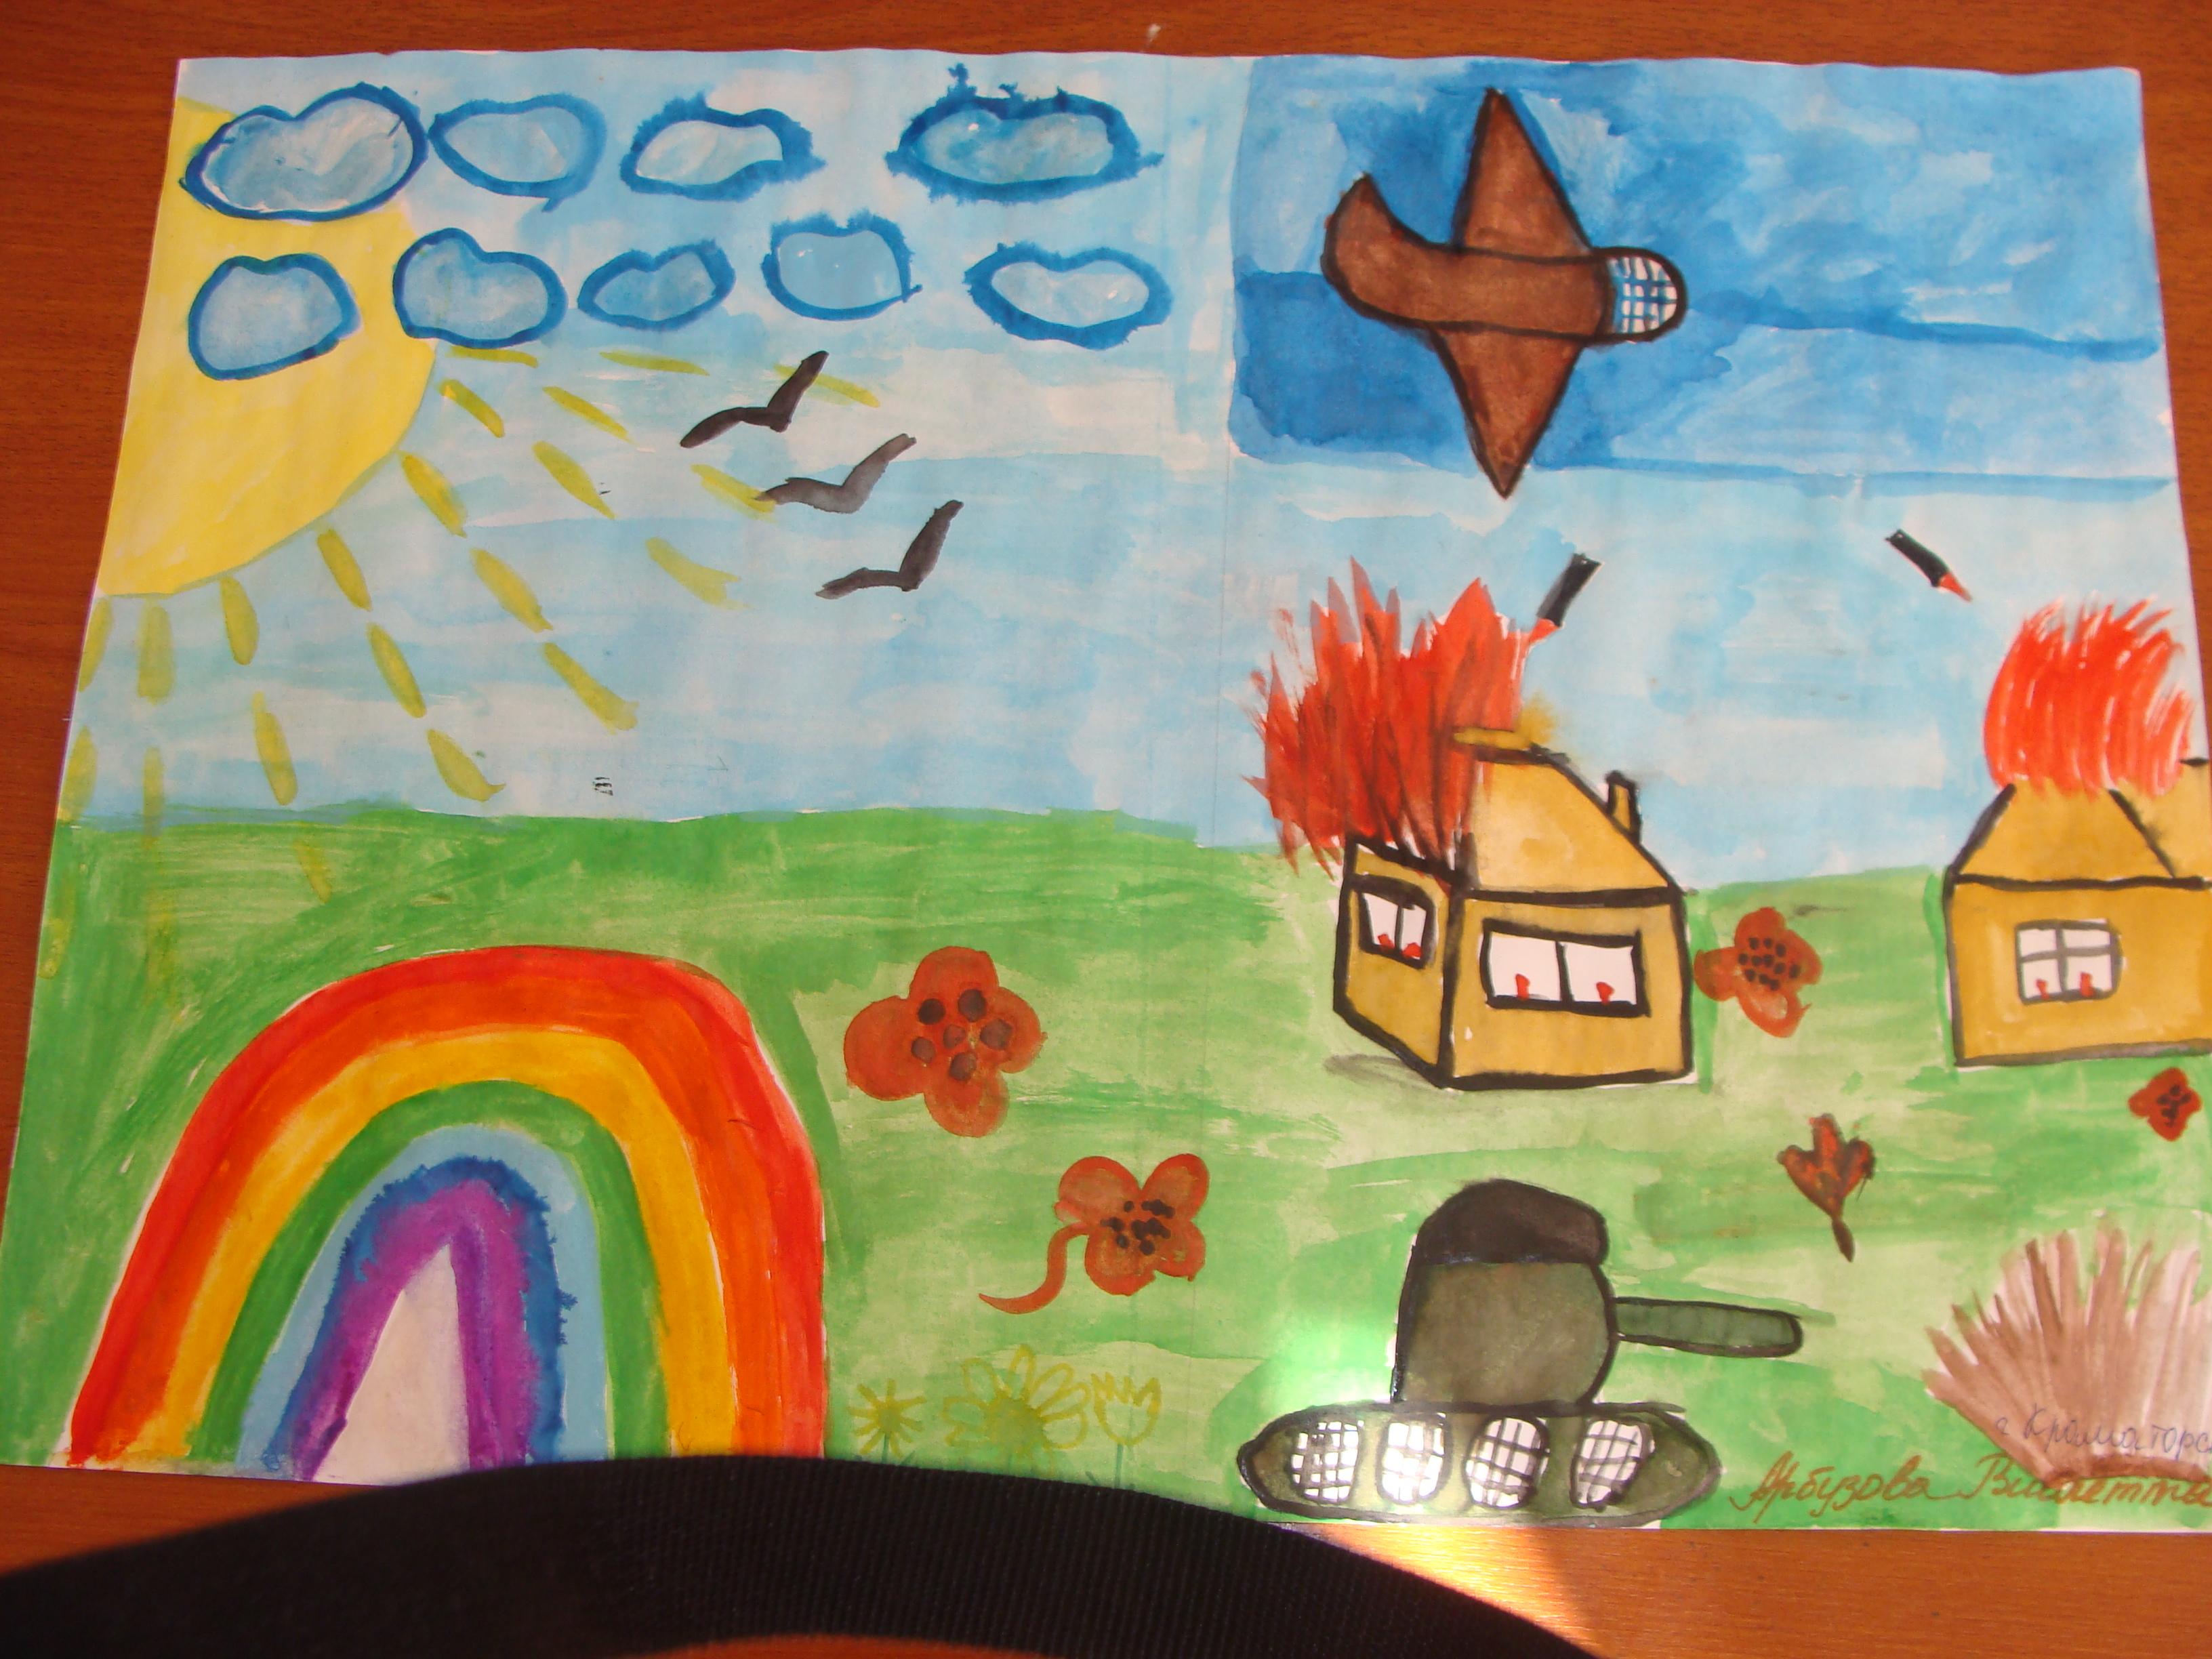 рисунок беженцев детей